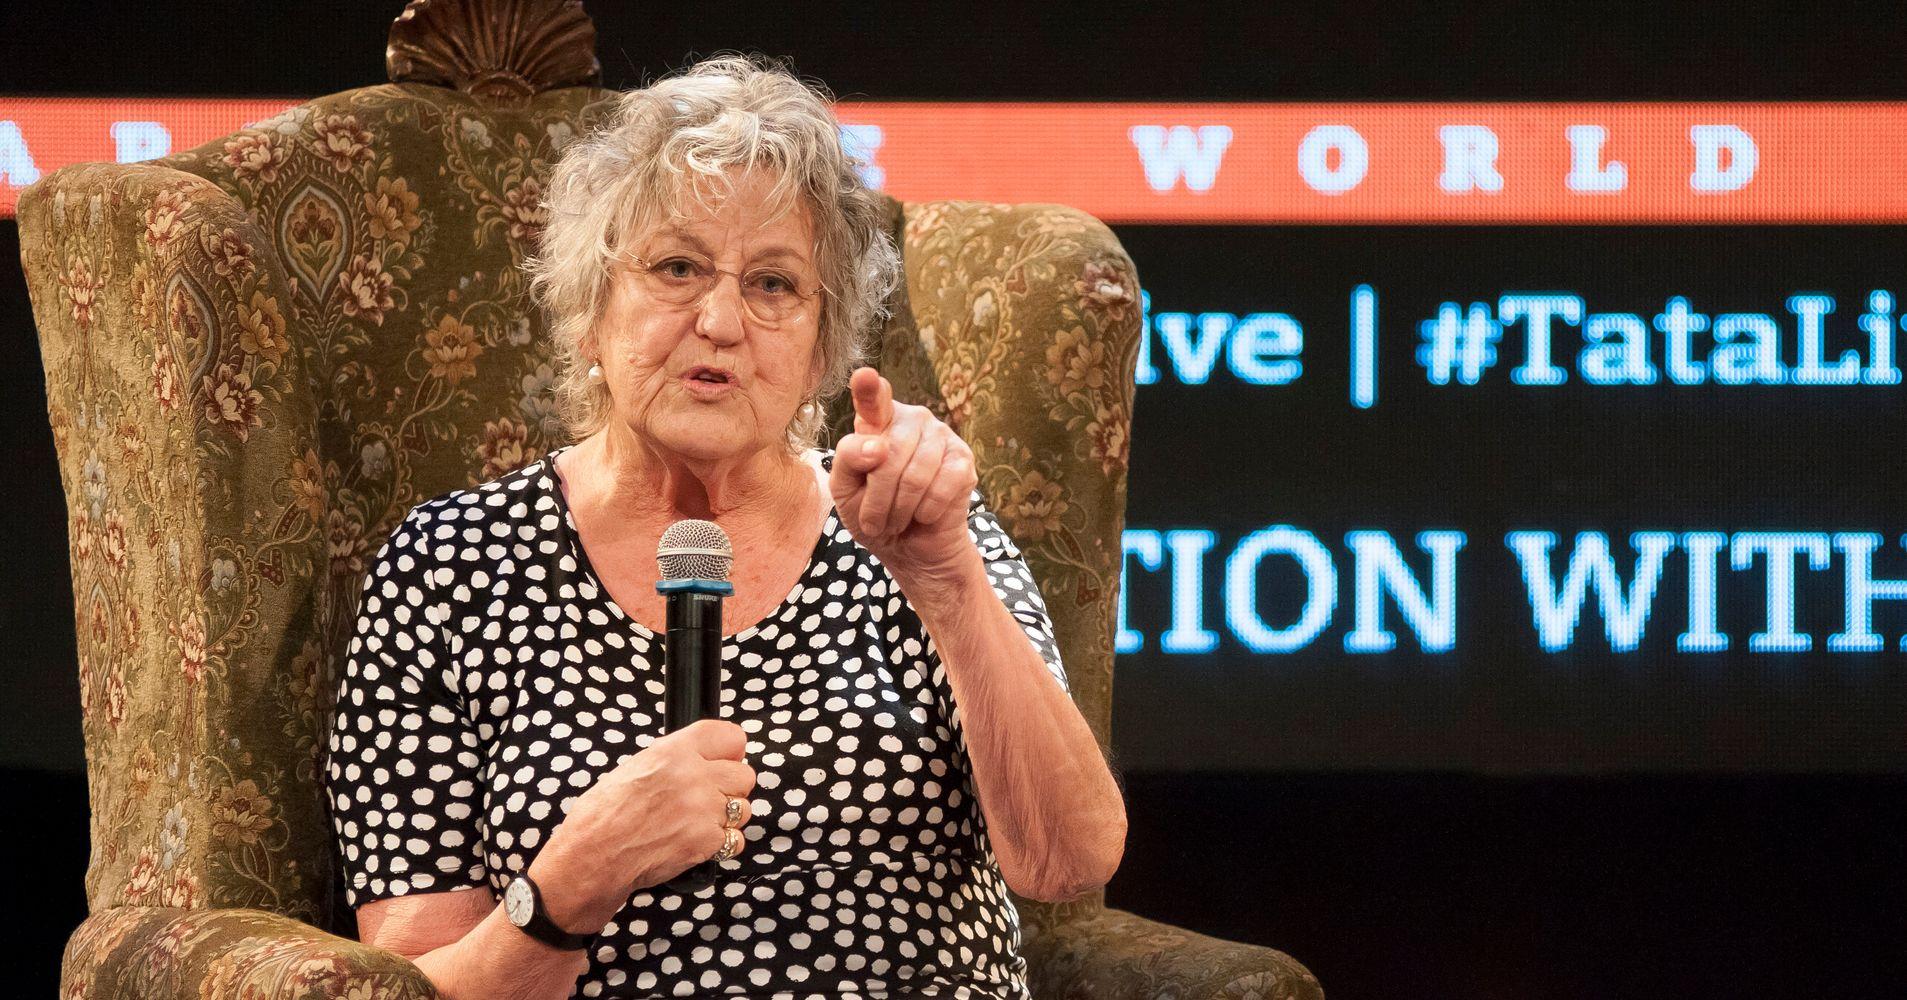 Feminist Author Germaine Greer Says Most Rape Is 'Bad Sex'